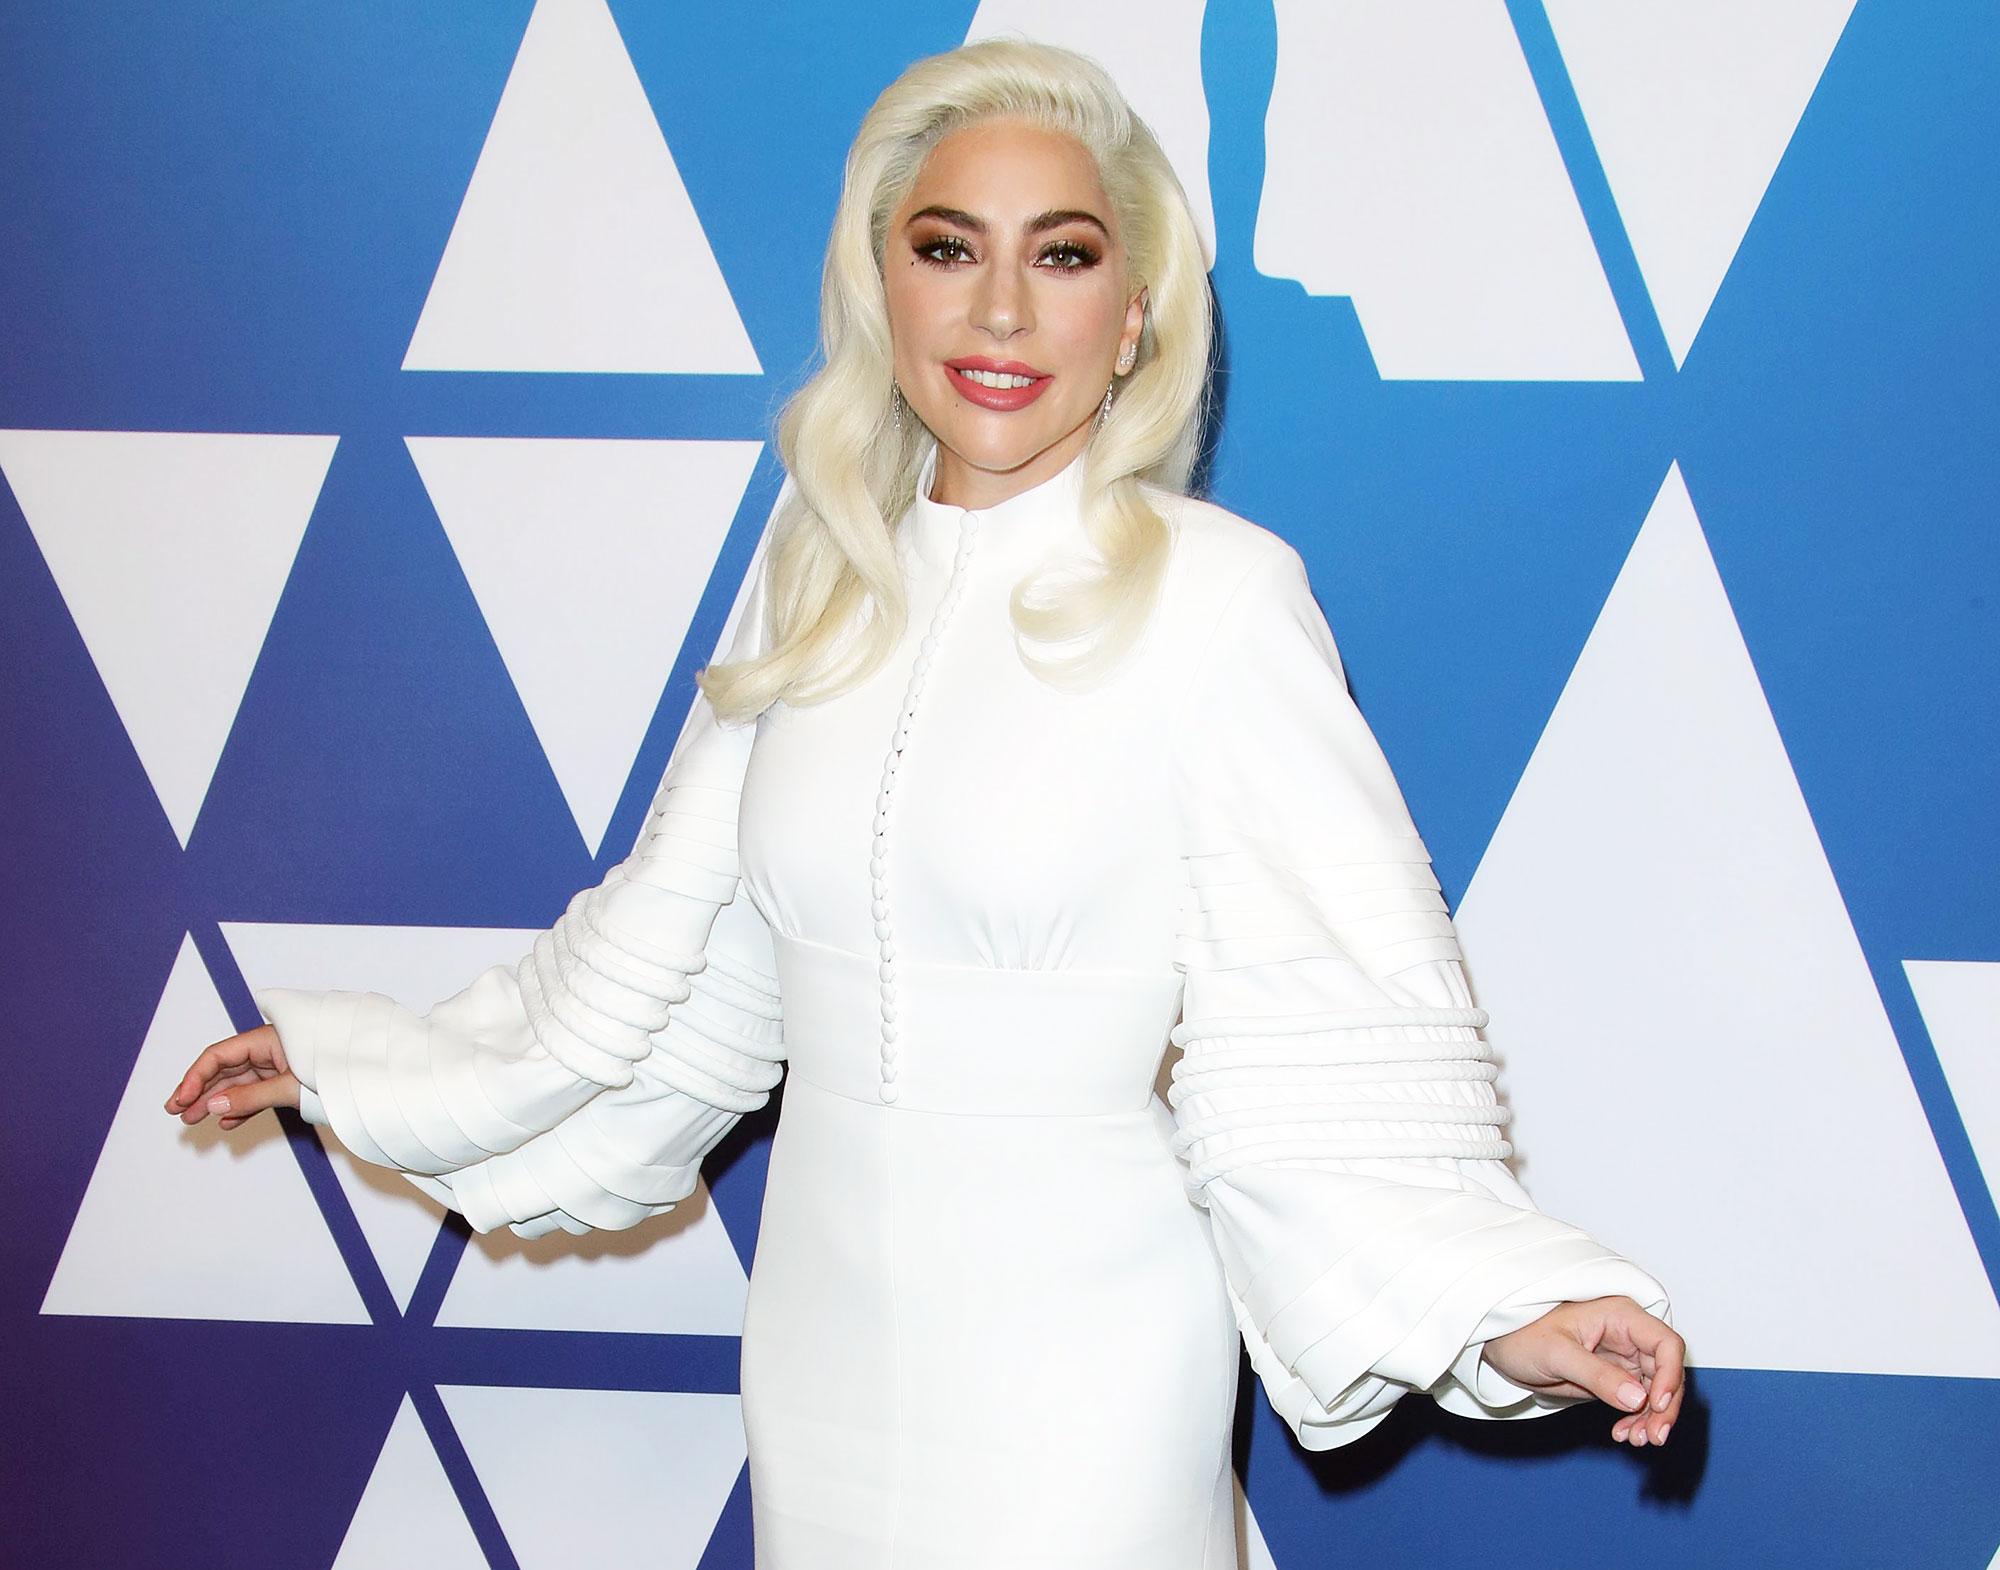 Lady Gaga Shares New Selfie With Boyfriend Michael Polansky